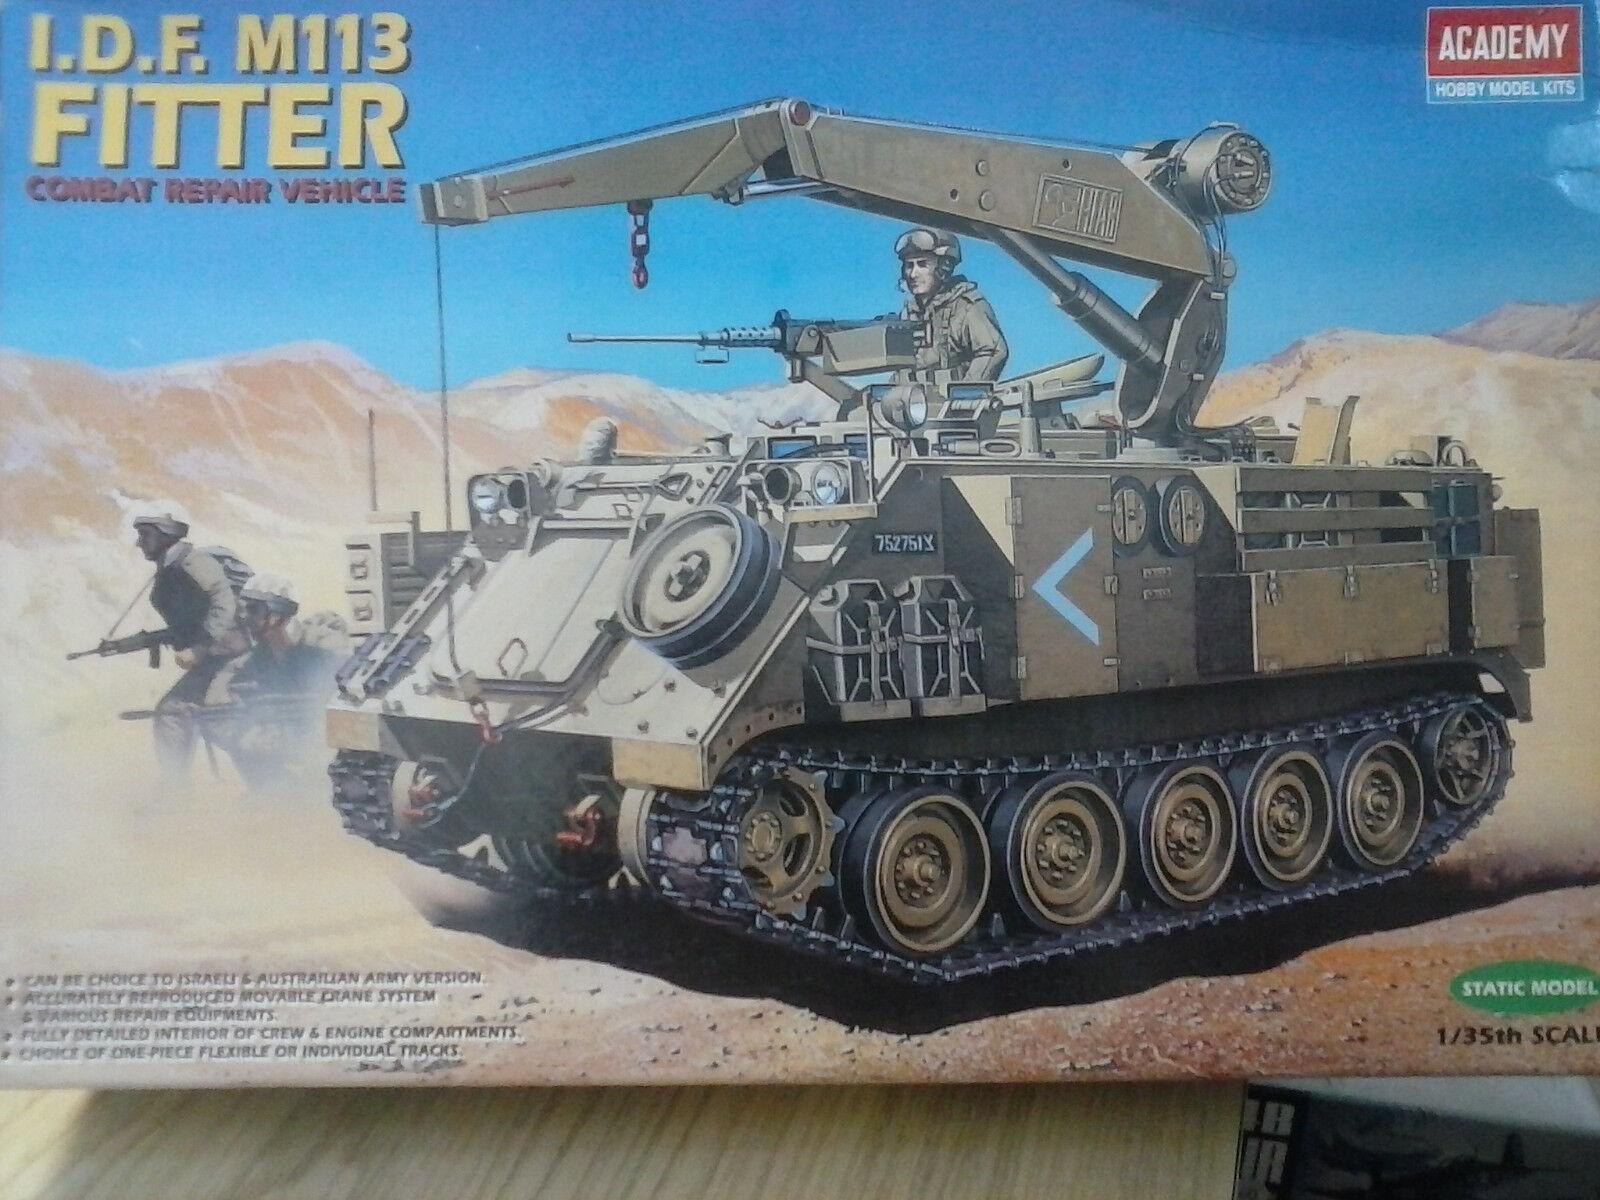 ACADEMY 1 35 MEZZO MILITARE I.D.F. M113 FITTER COMBAT REPAIR VEHICLE  ART 1388